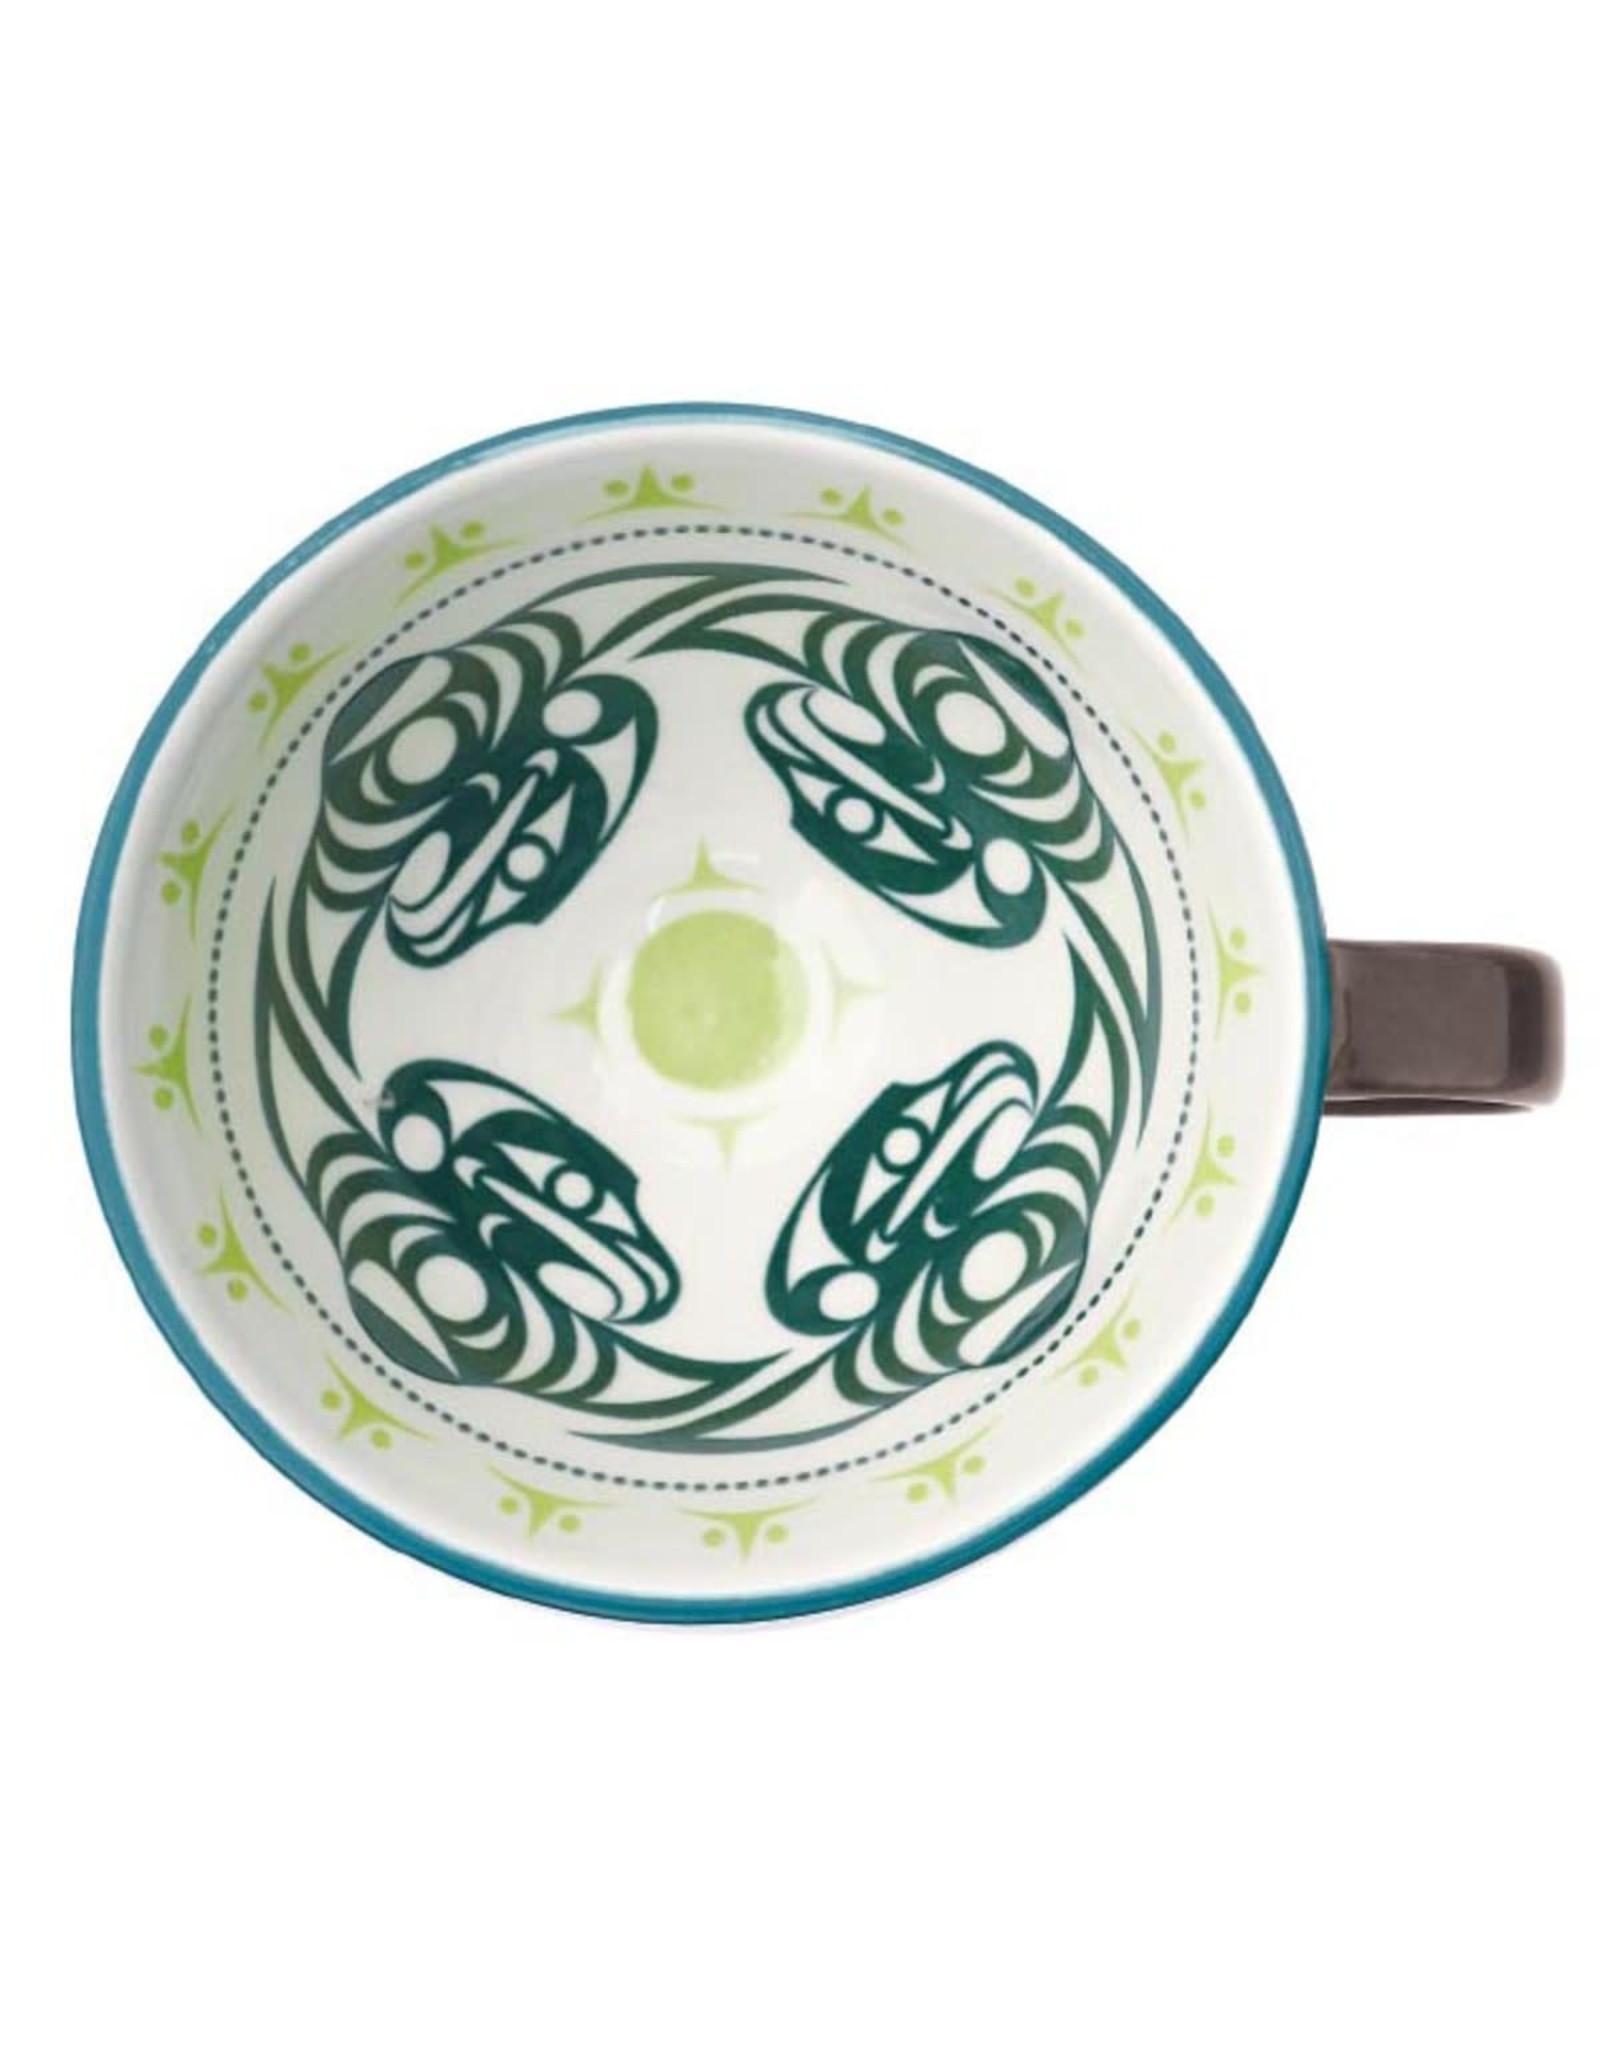 Porcelain Art Mug - Thunderbird by Dylan Thomas